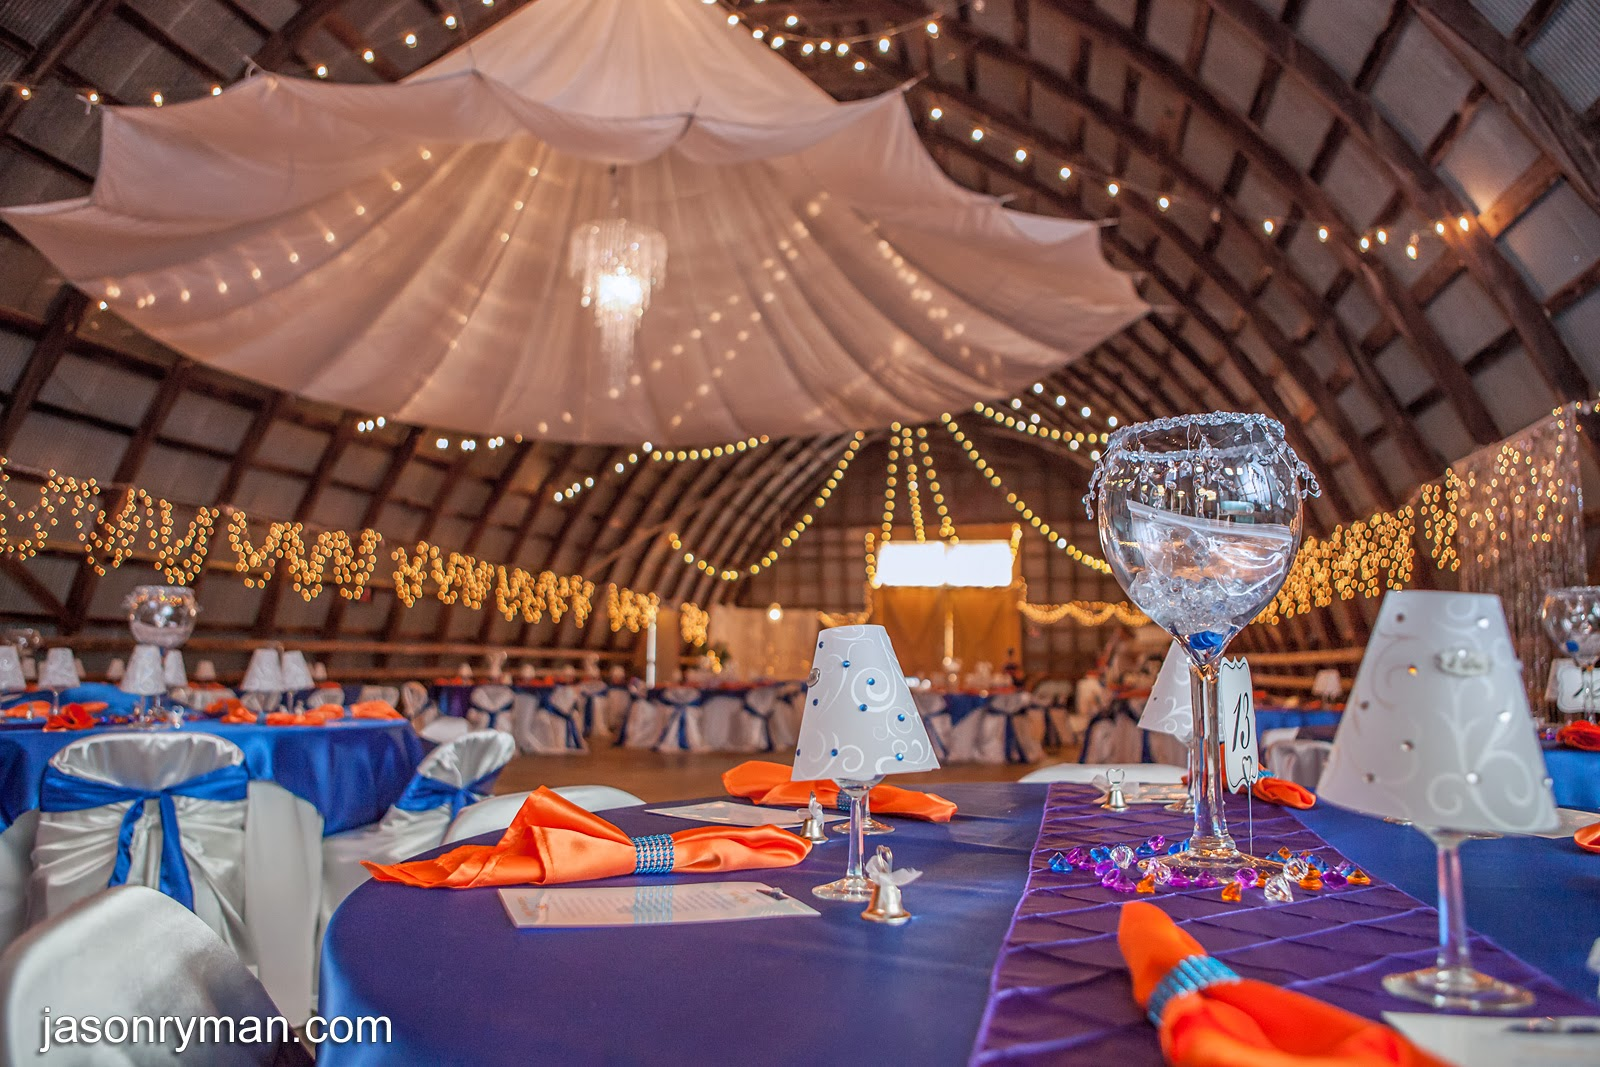 Jason ryman photography wichita kansas wedding photography for Wedding photographers wichita ks